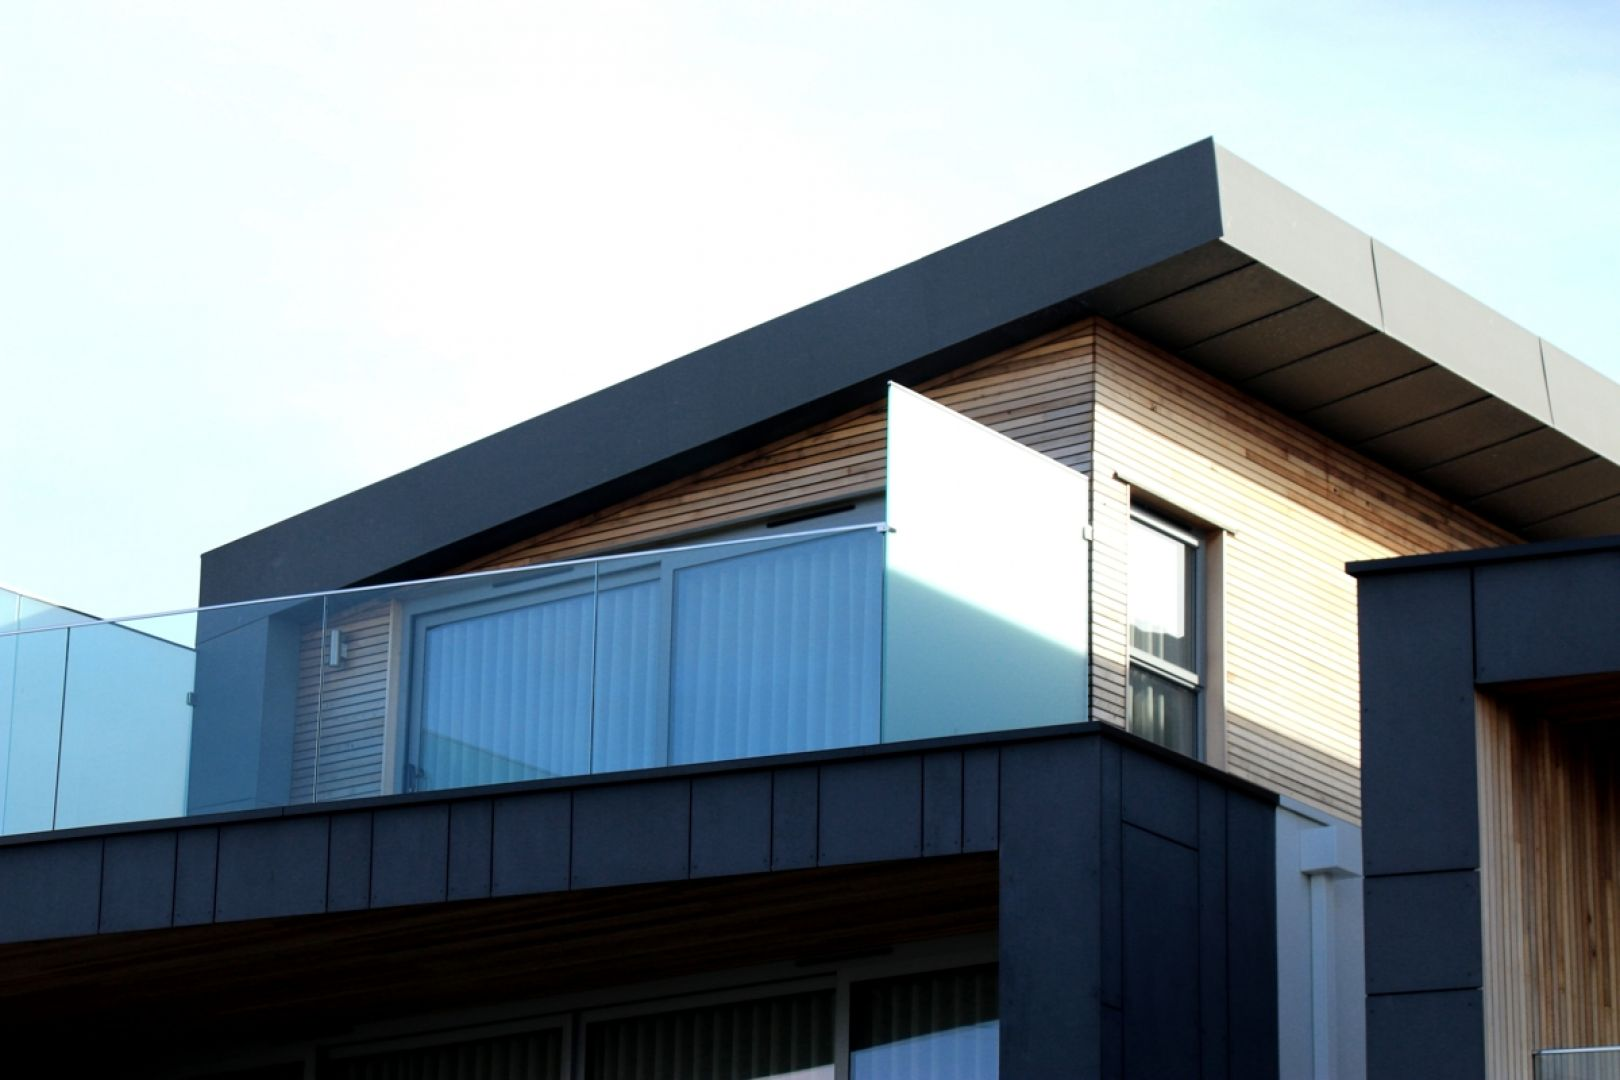 Dach płaski. Fot. pexels